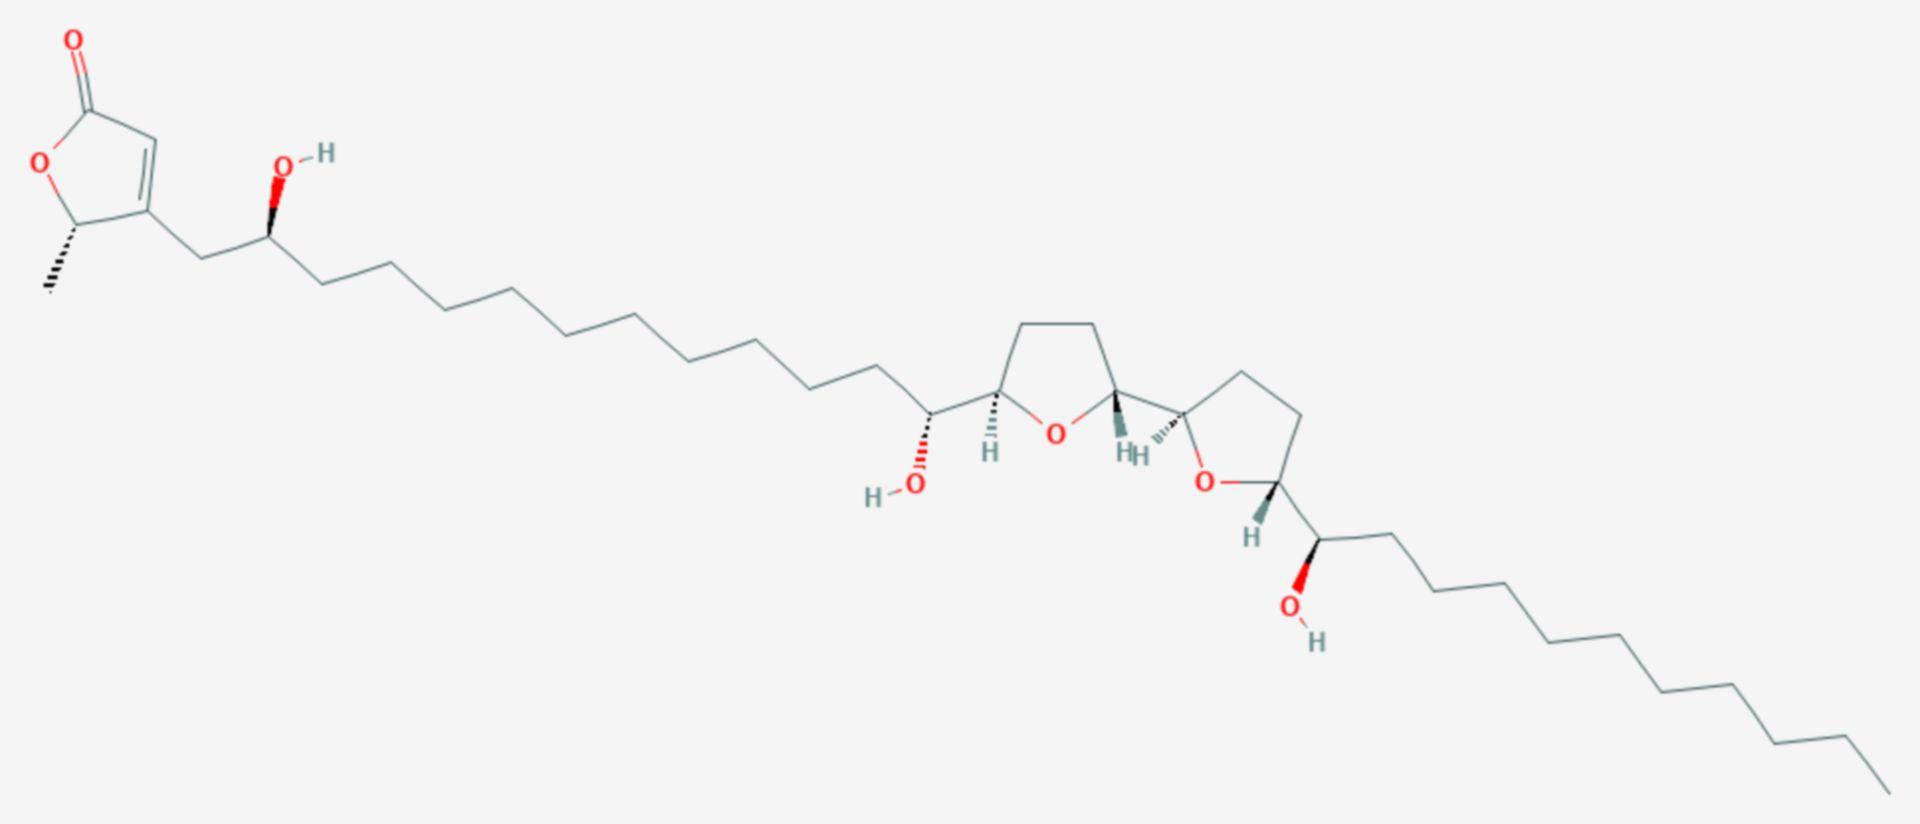 Asimicin (Strukturformel)